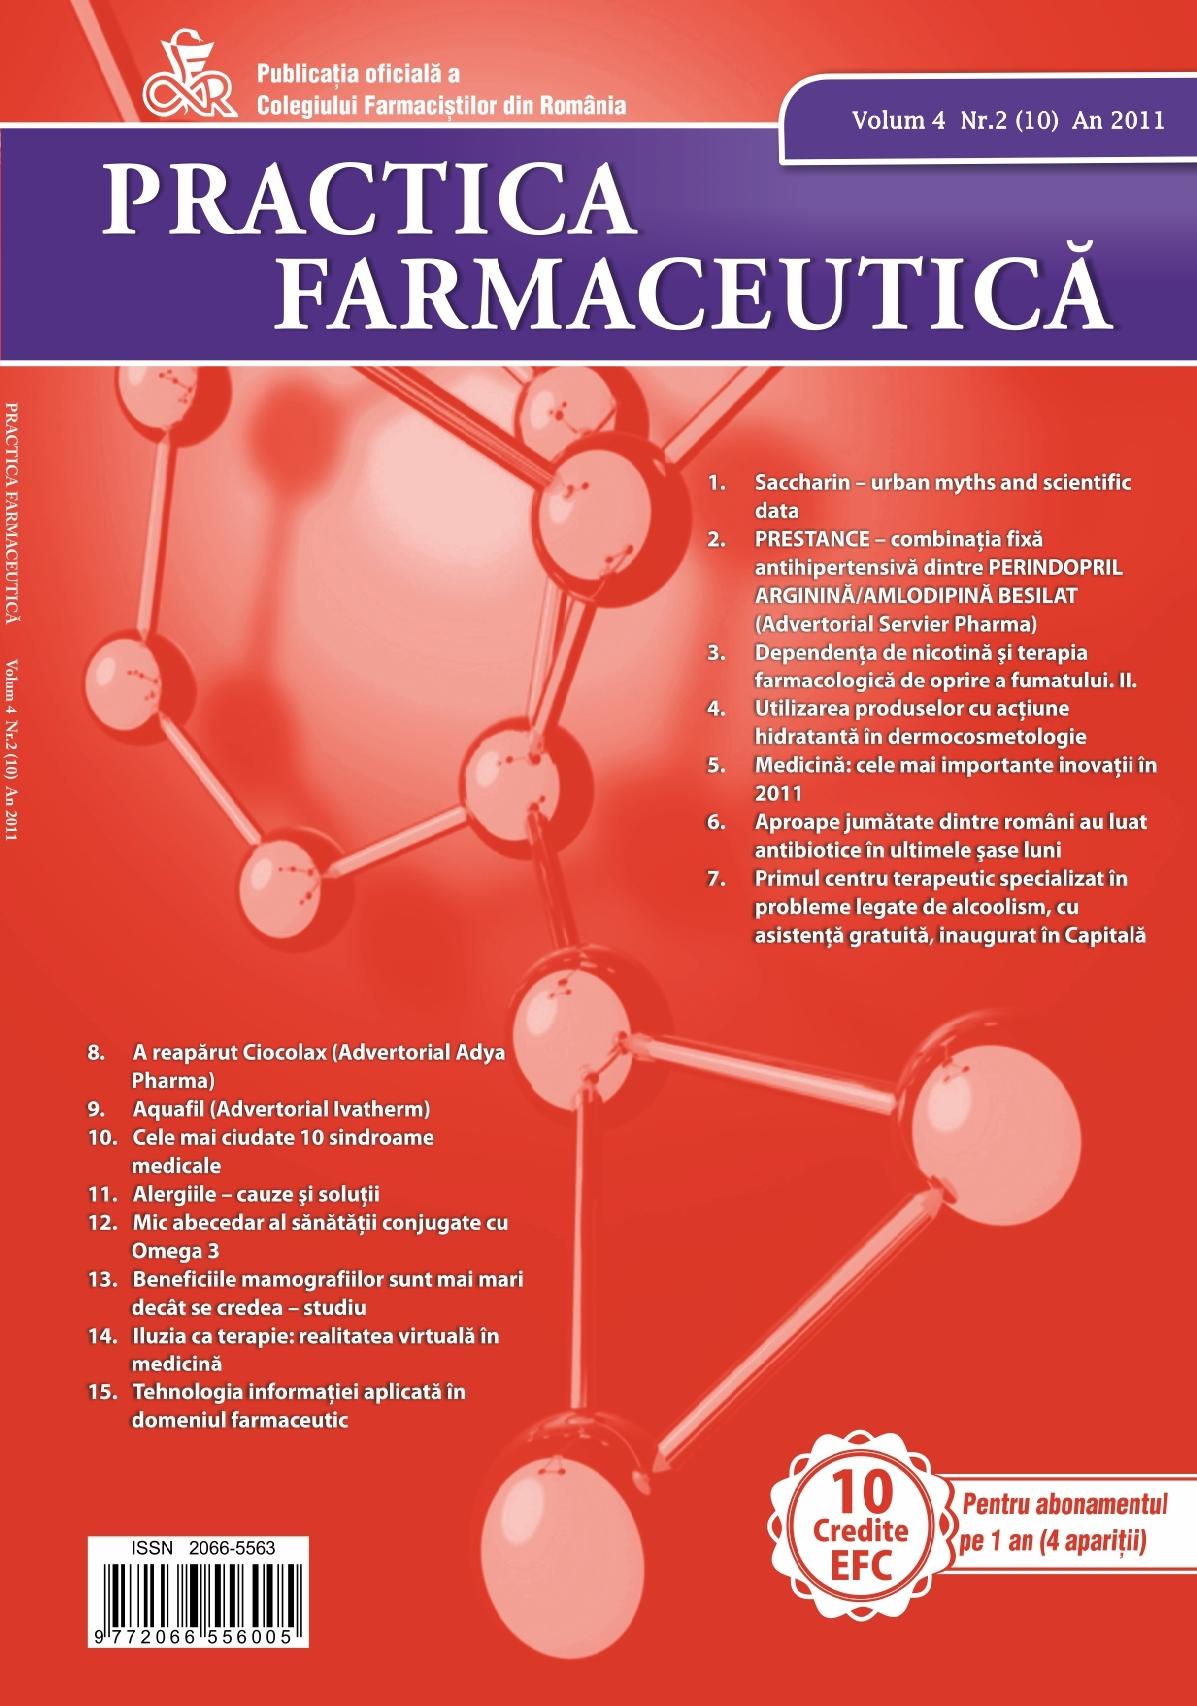 Revista Practica Farmaceutica, Vol. IV, No. 2 (10), 2011